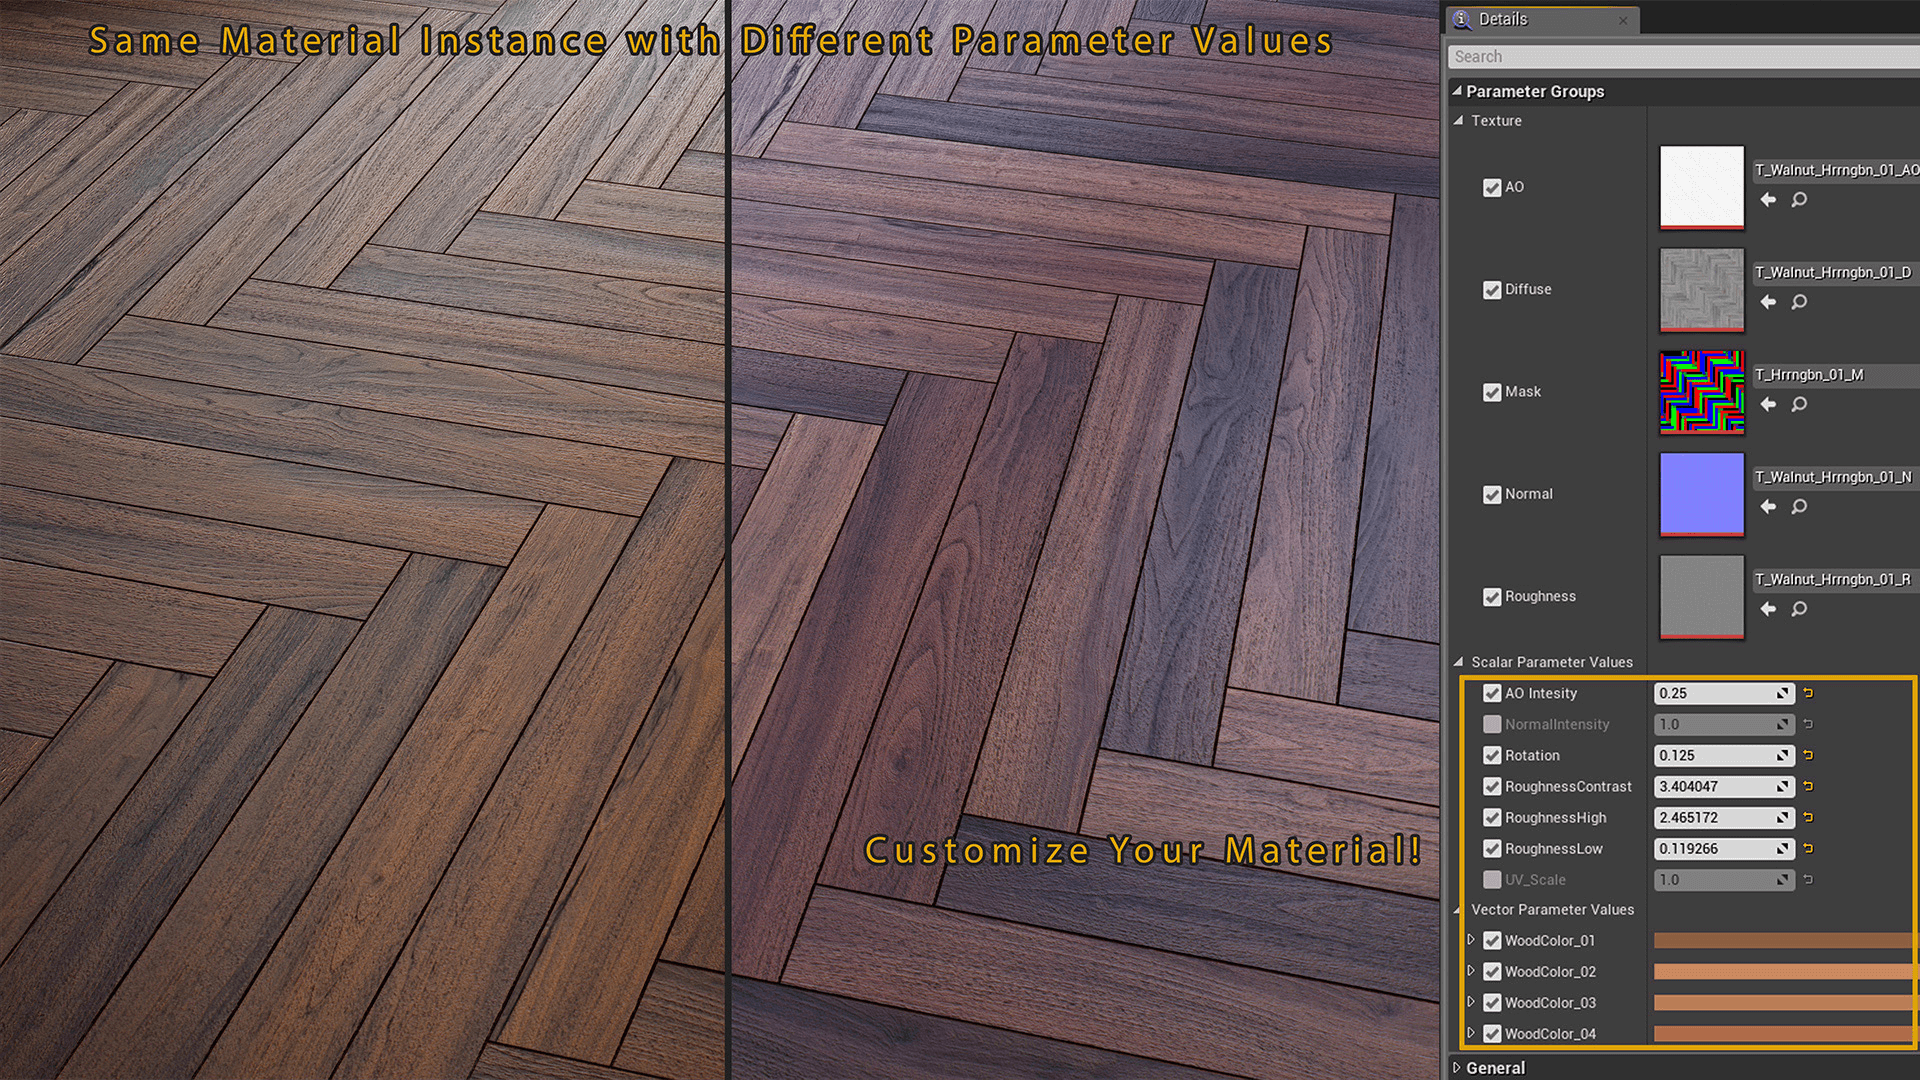 Floor Materials 4k materials wood flooringkarl detroit in materials - ue4